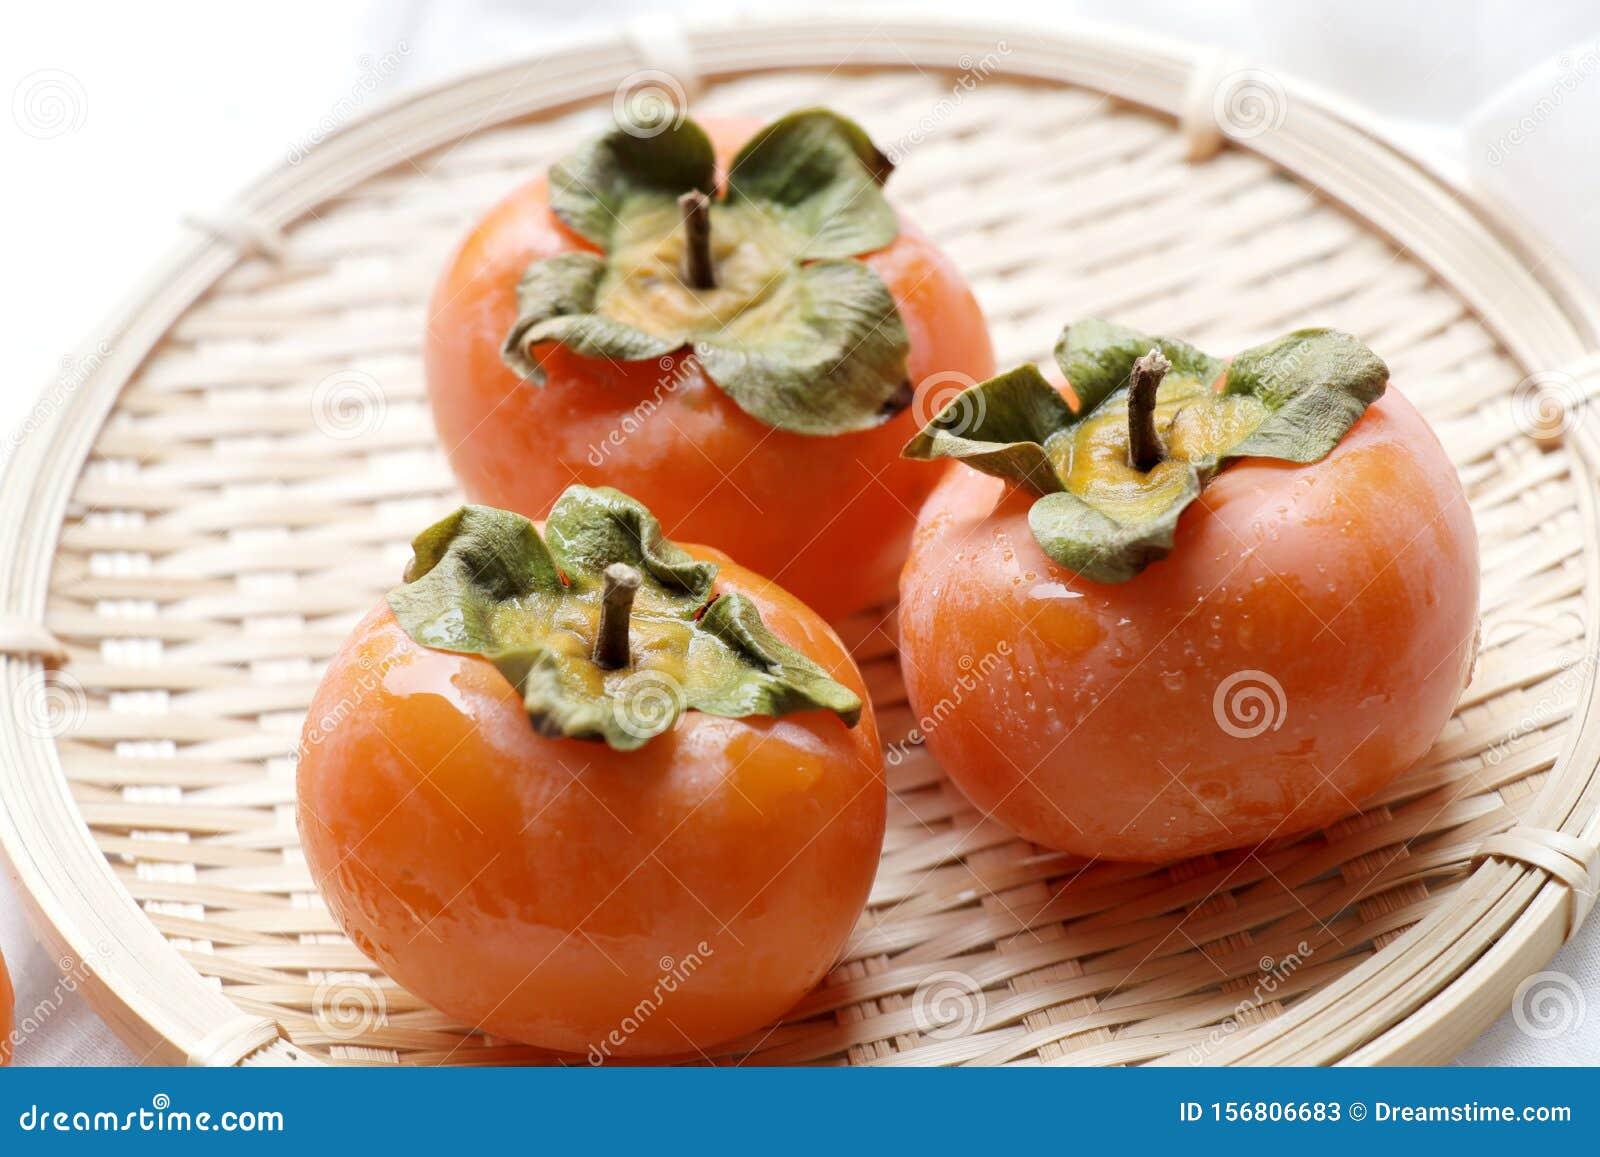 Fresh kaki on basket.Ripe orange persimmon fruit.